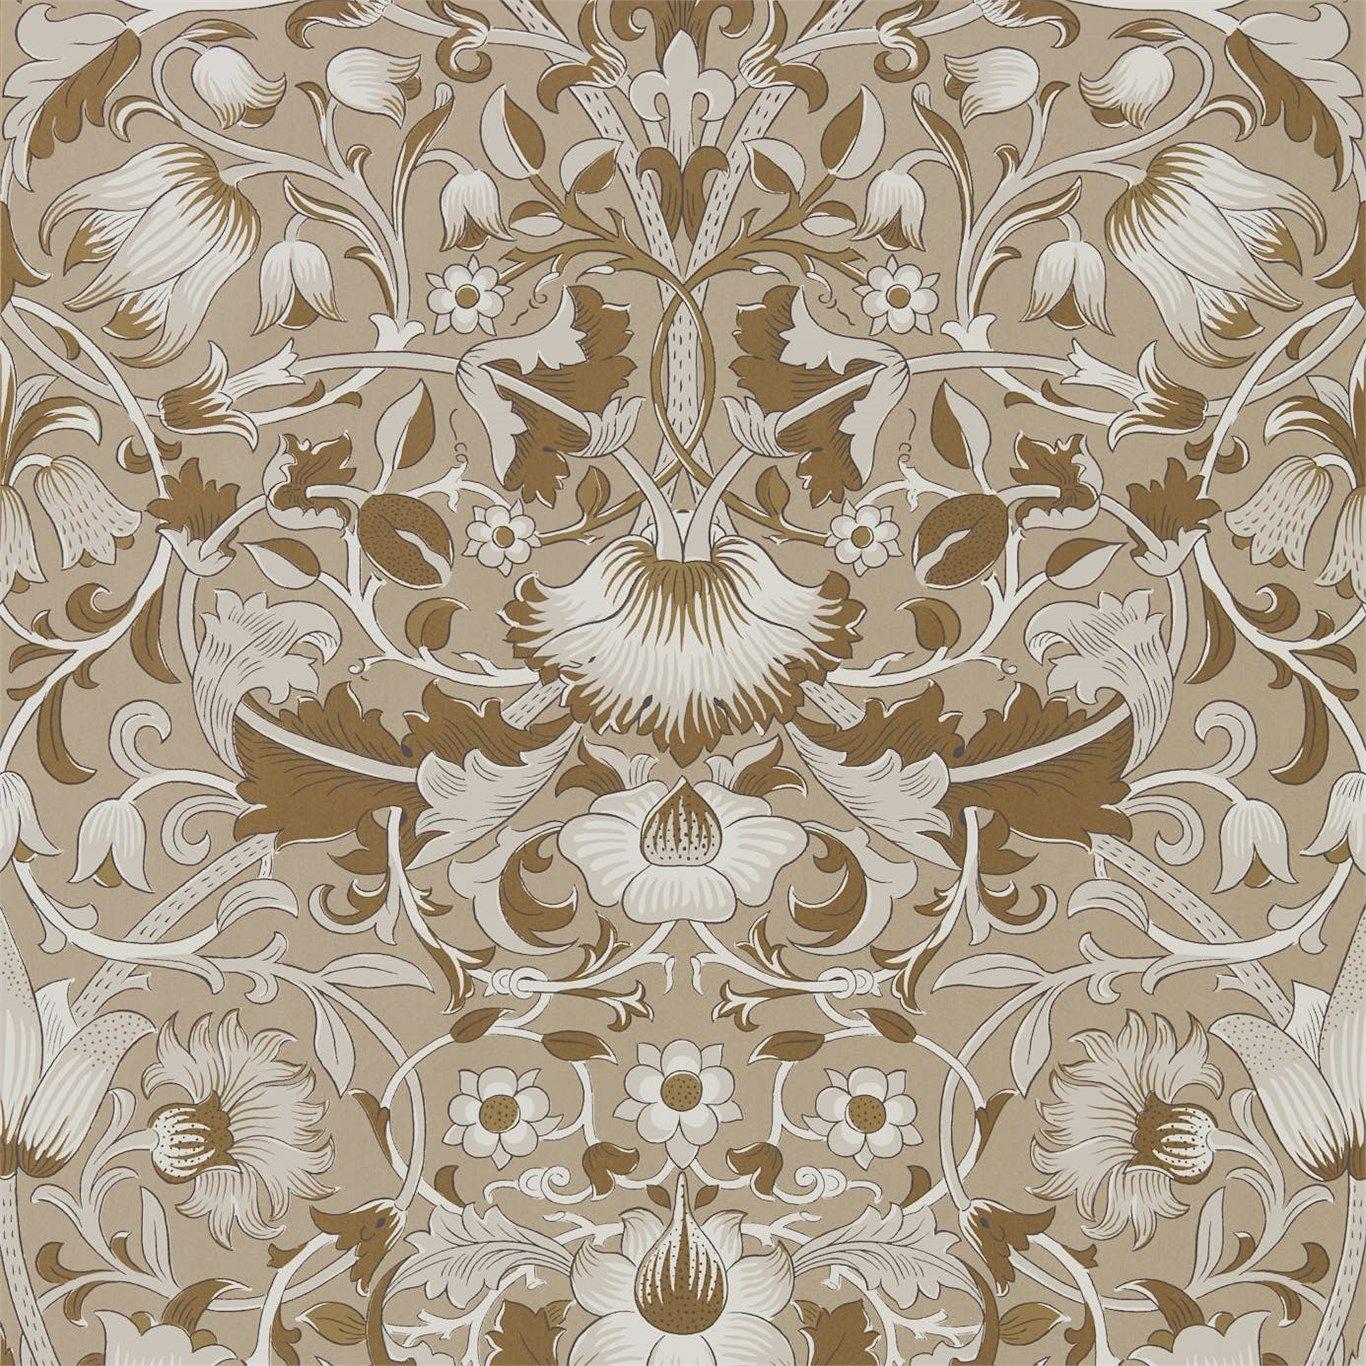 The Original Morris & Co Arts and crafts, fabrics and